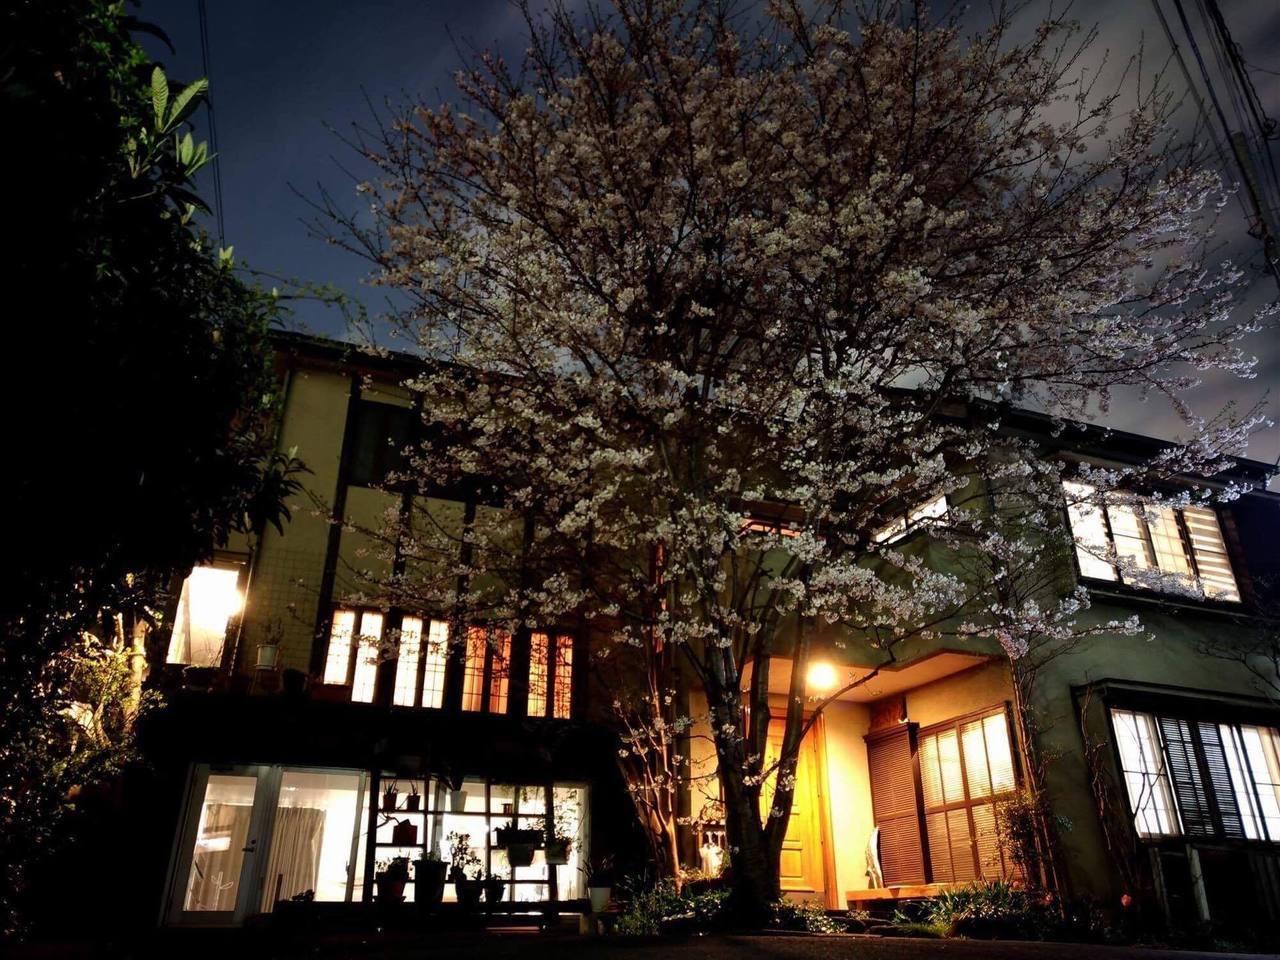 【元外交官の館 本館】6LDK+2T+2B 母屋貸切! の写真